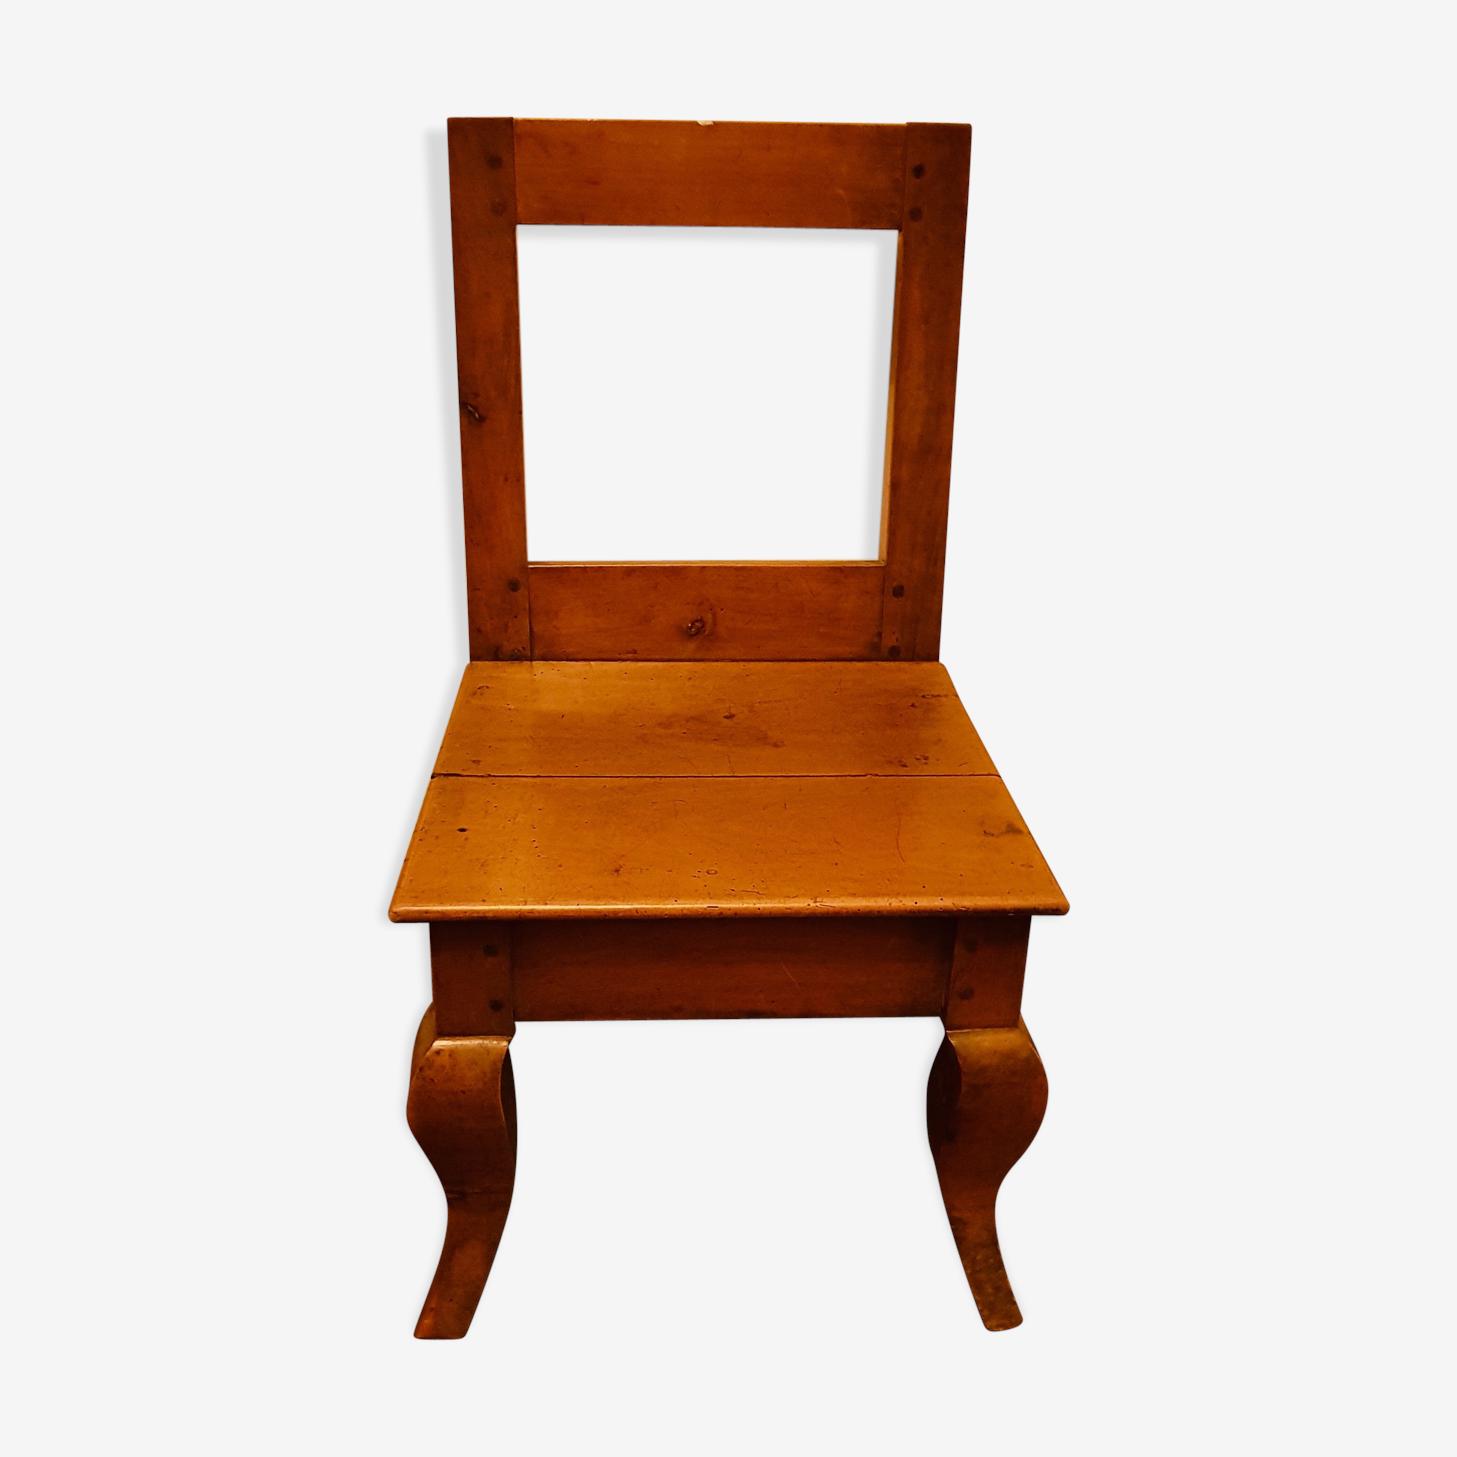 Chaise enfant lorraine ancienne